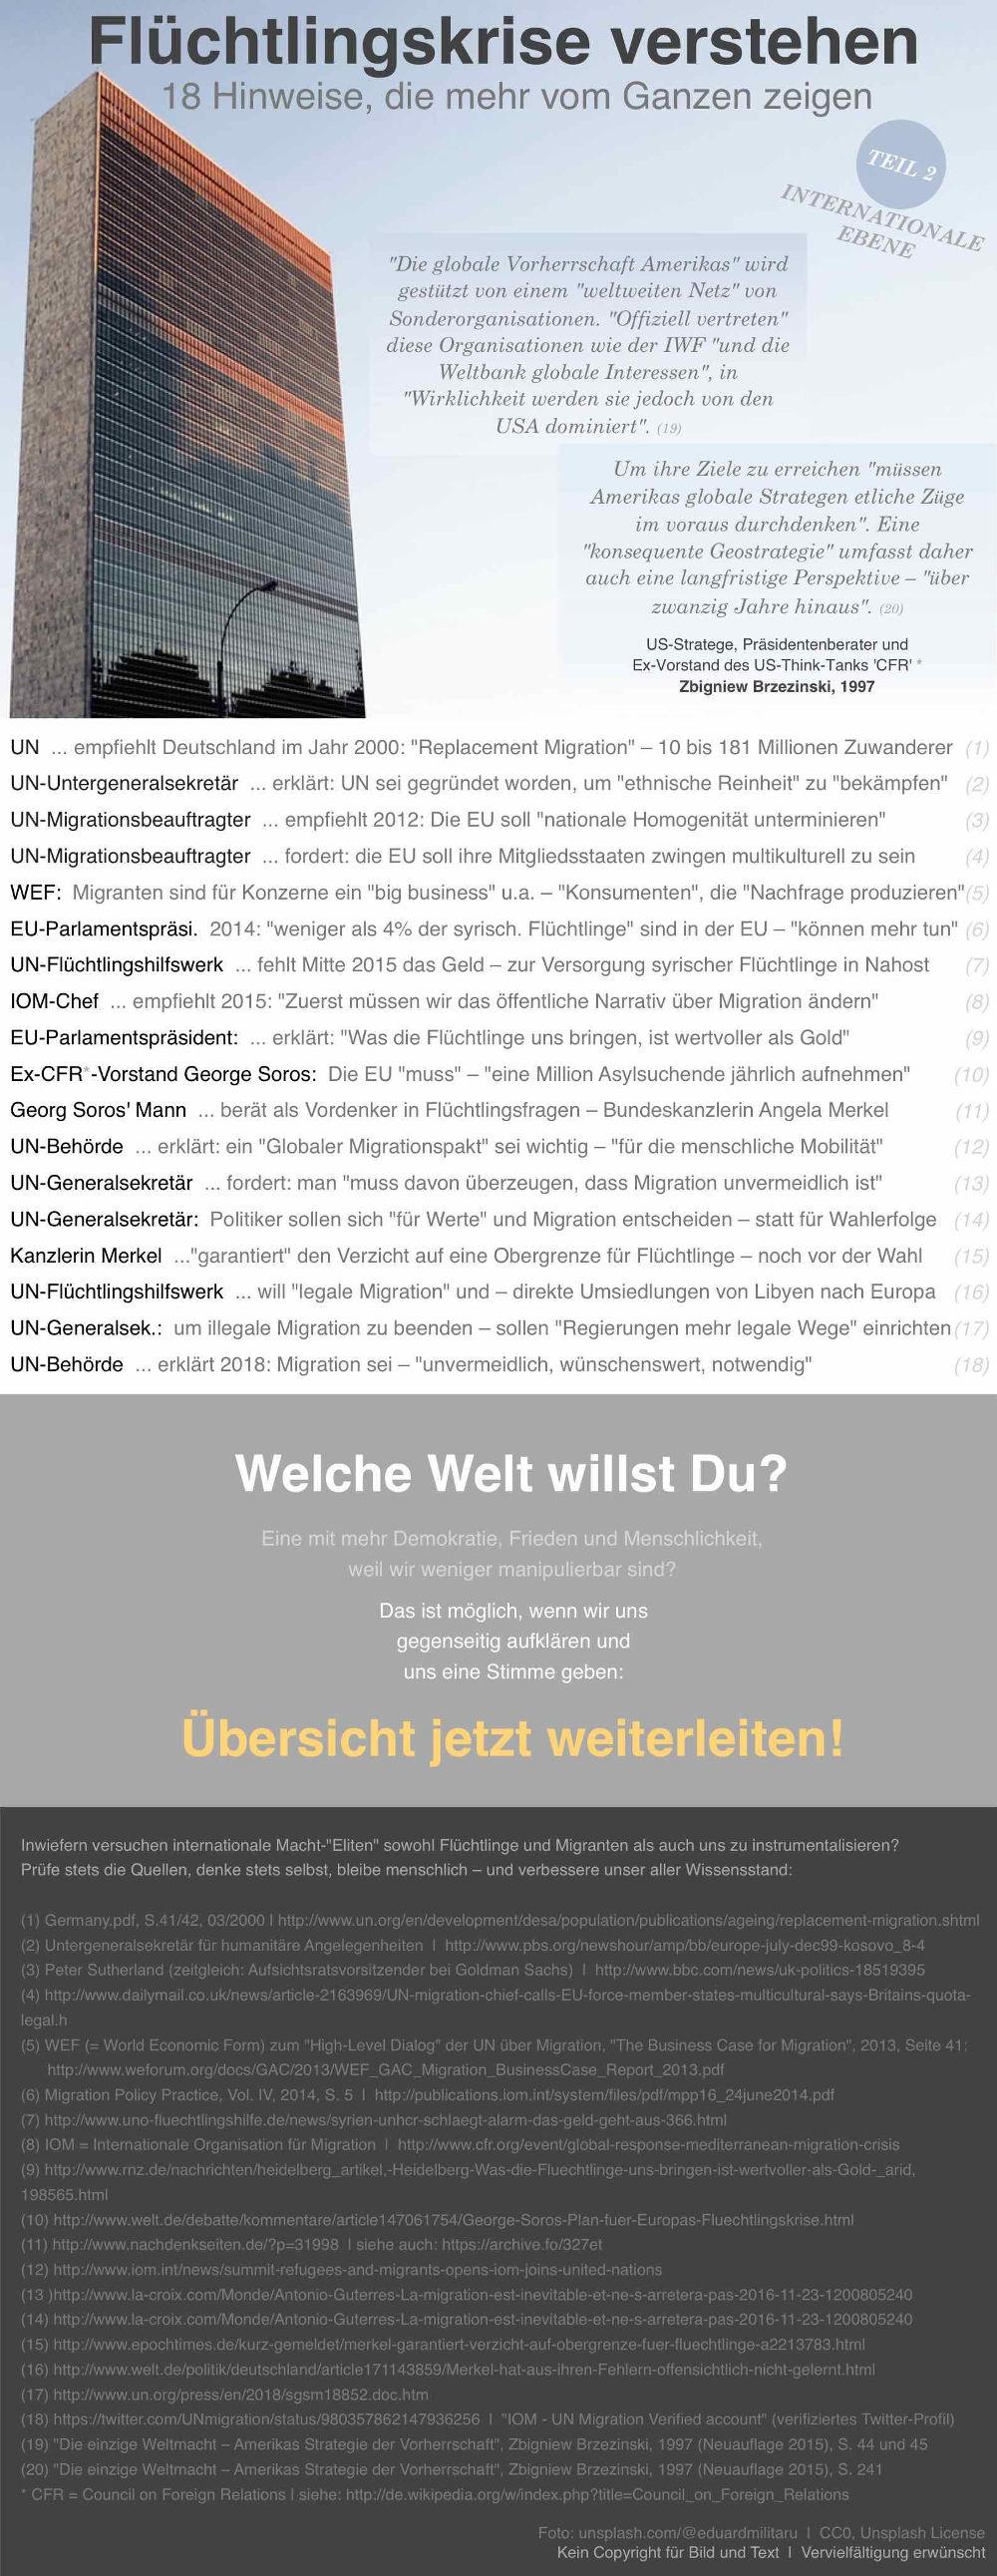 Infografik – Flüchtlingskrise verstehen 2 – Bildquelle: unbekannt / unsplash.com/@eduardmilitaru | CC0, Unsplash License